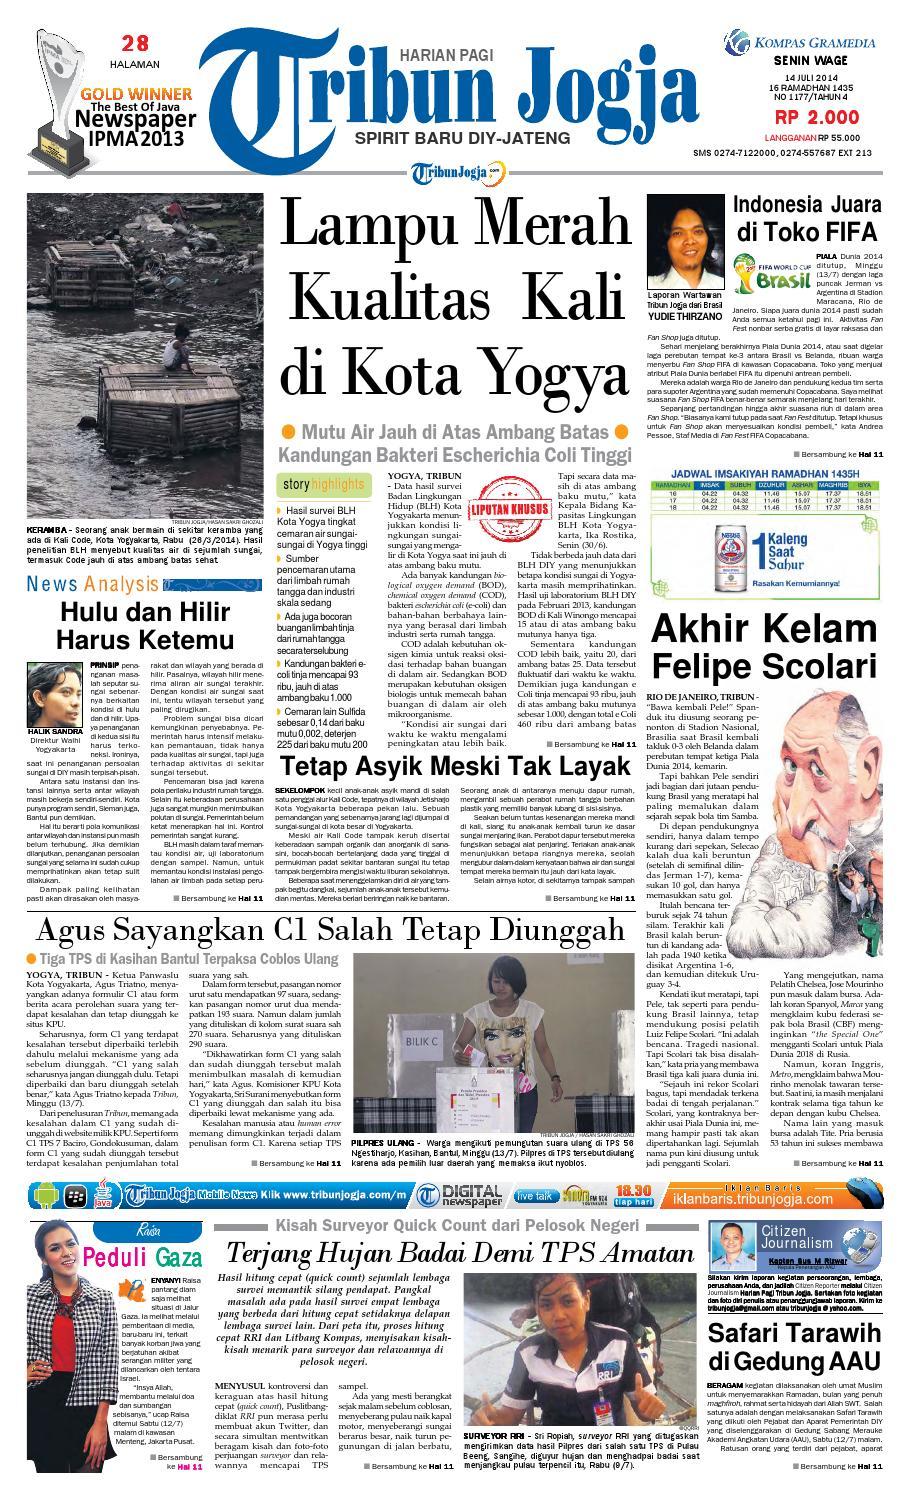 Tribunjogja 14 07 2014 By Tribun Jogja Issuu Produk Ukm Bumn Dress Gamis Batik Motif Ayam Bekisar